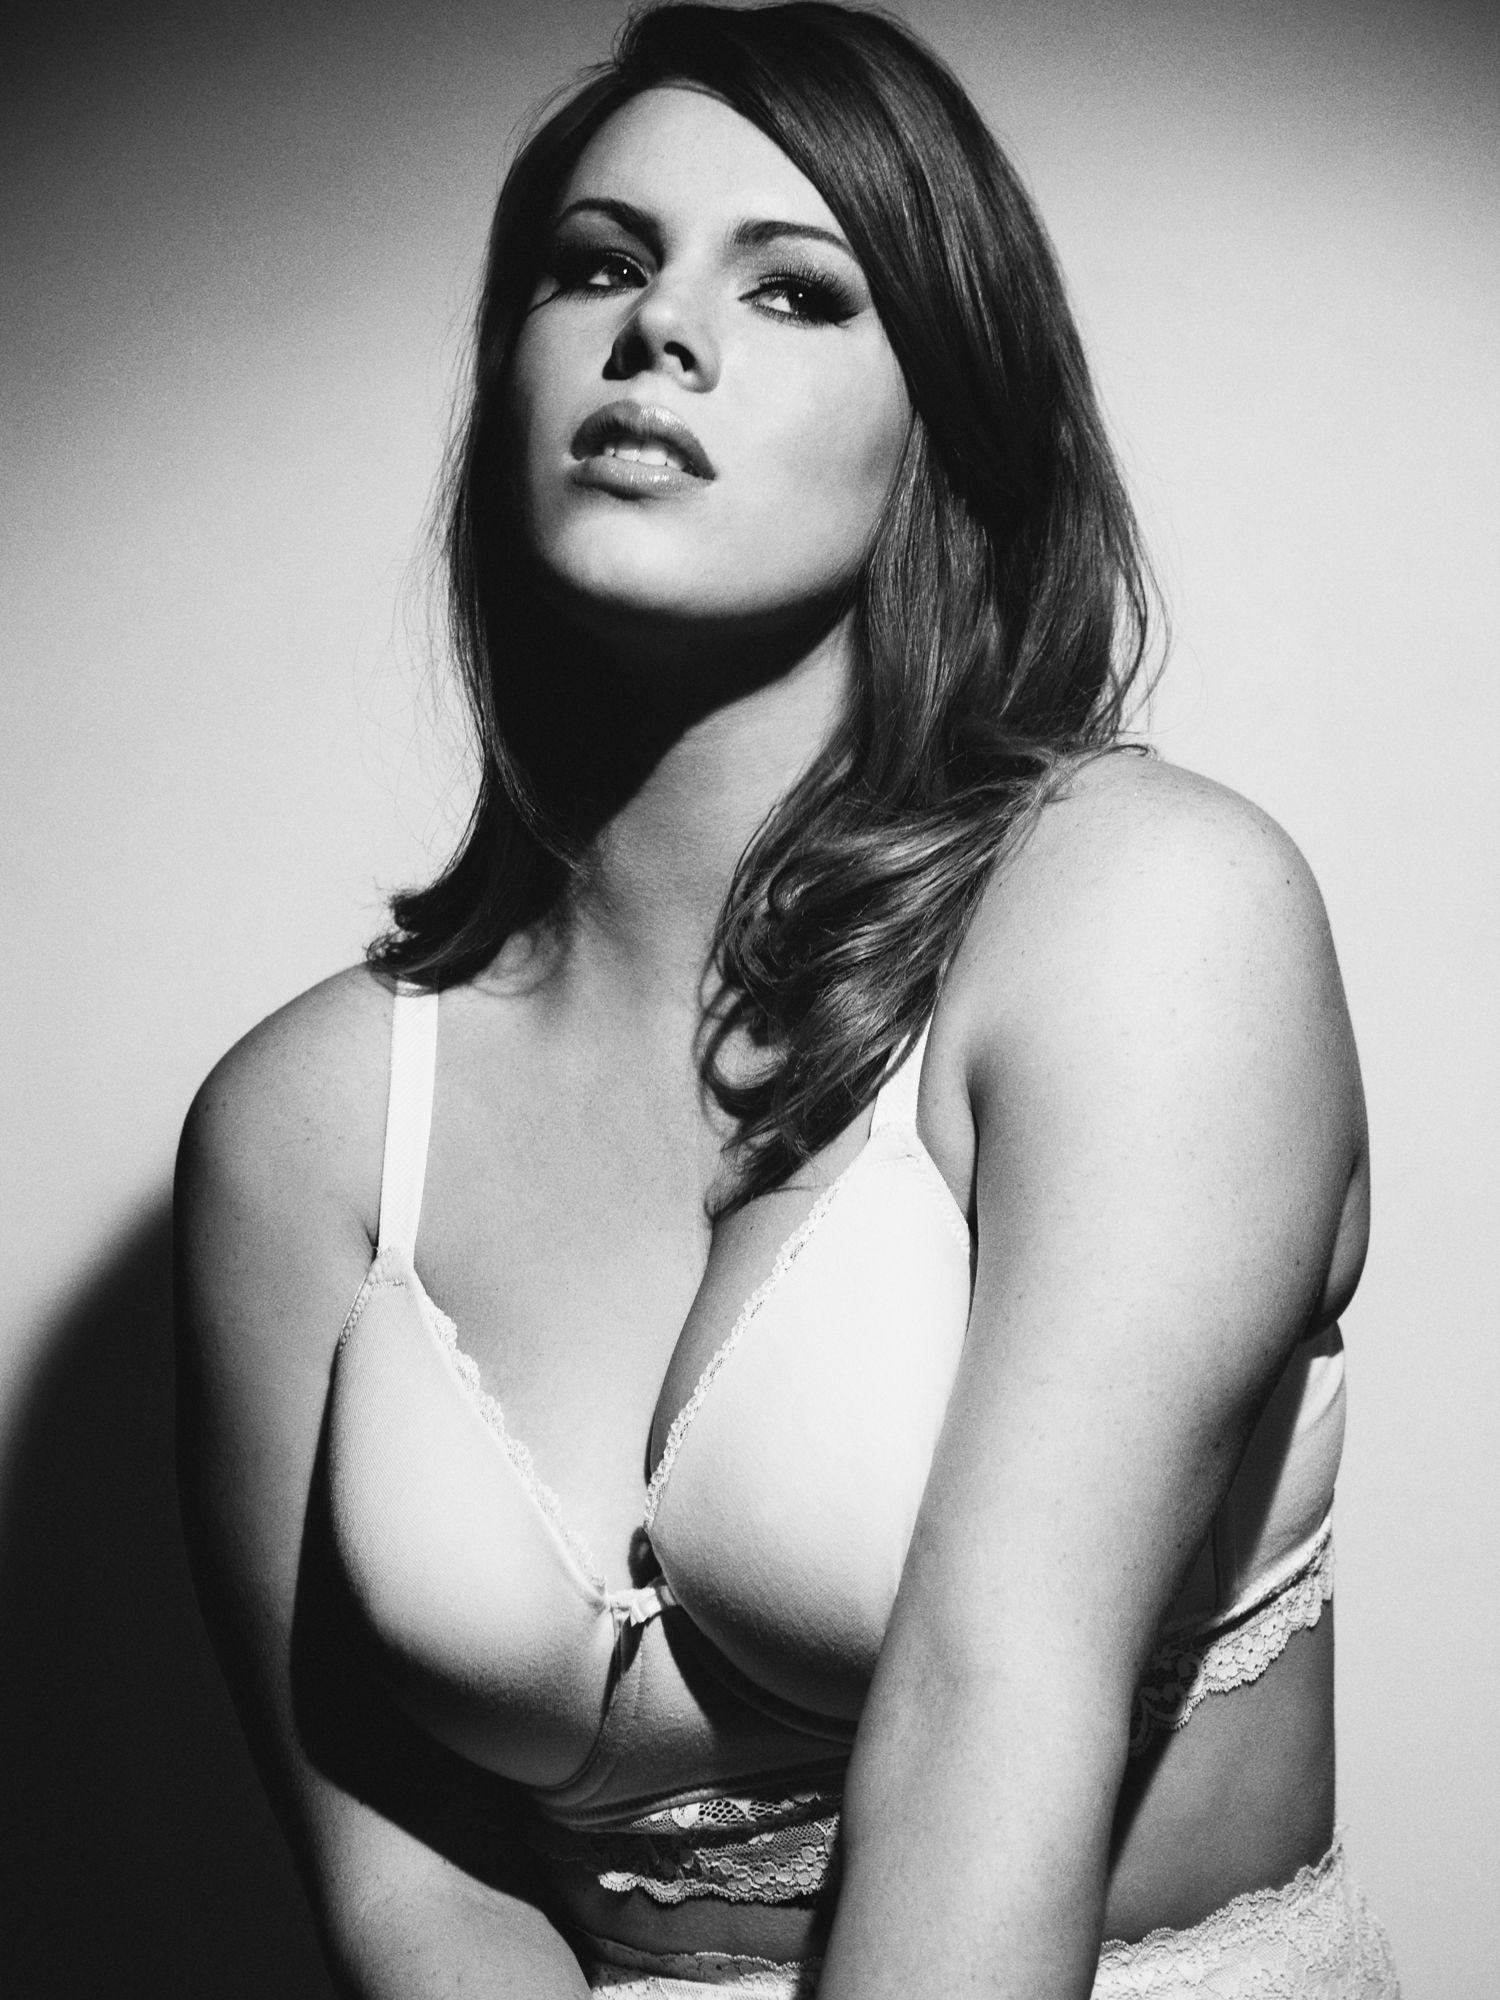 Mariah Morvant nudes (29 photos), foto Bikini, YouTube, panties 2017